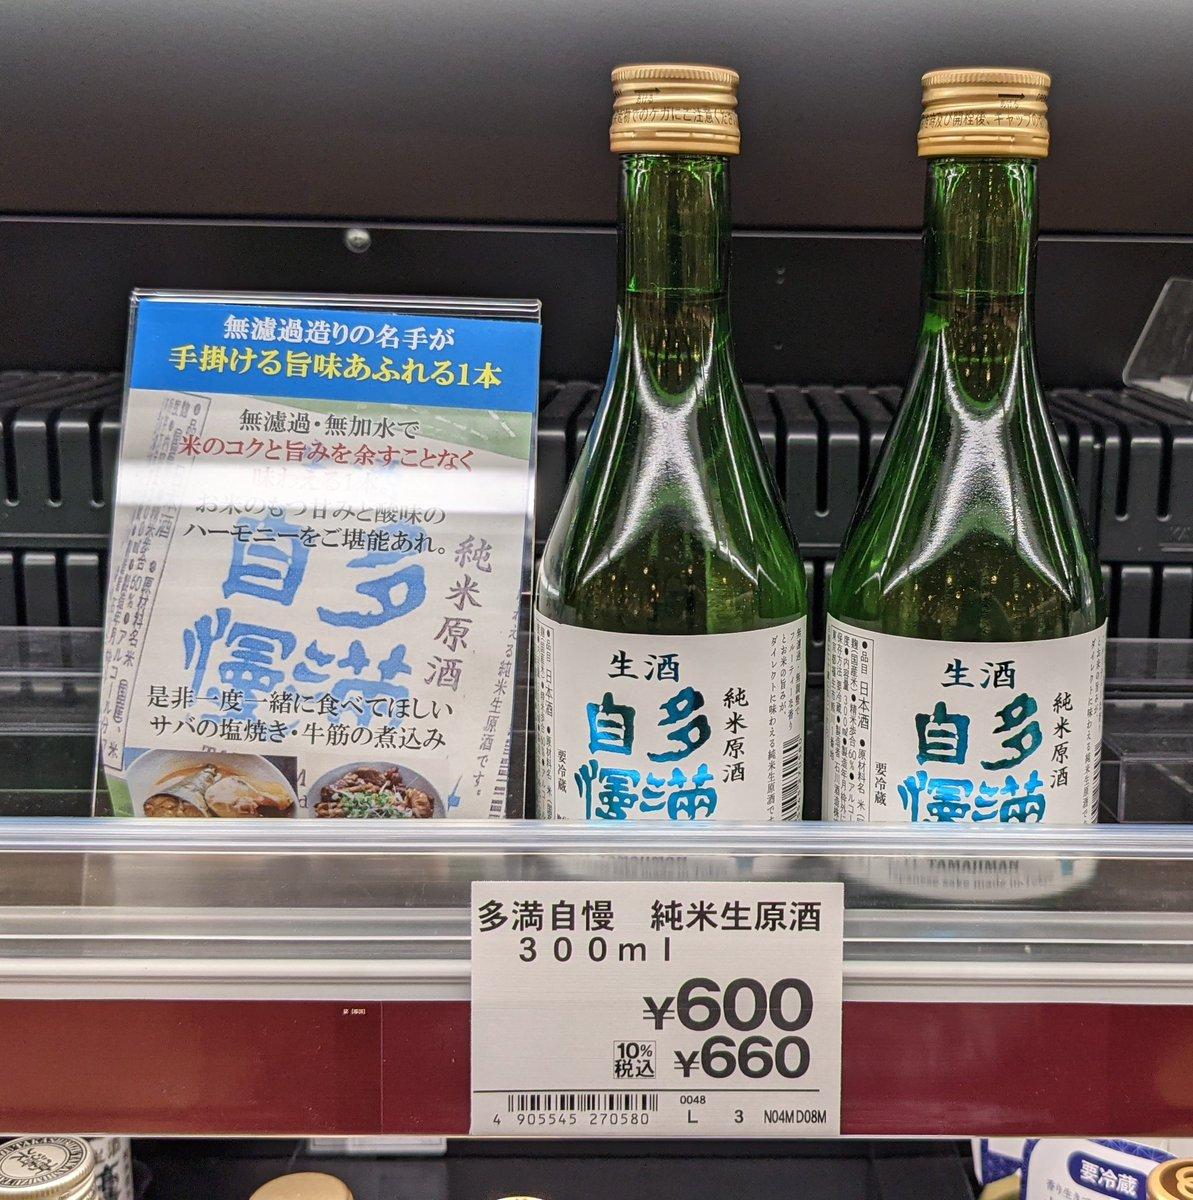 test ツイッターメディア - 石川酒造(@tamaji_man)さんに質問! このお酒はなーに? 見慣れないラベルなので限定酒なのかな?金額設定もお高め… #イトーヨーカドー #多満自慢 https://t.co/2gLQCUJ30l